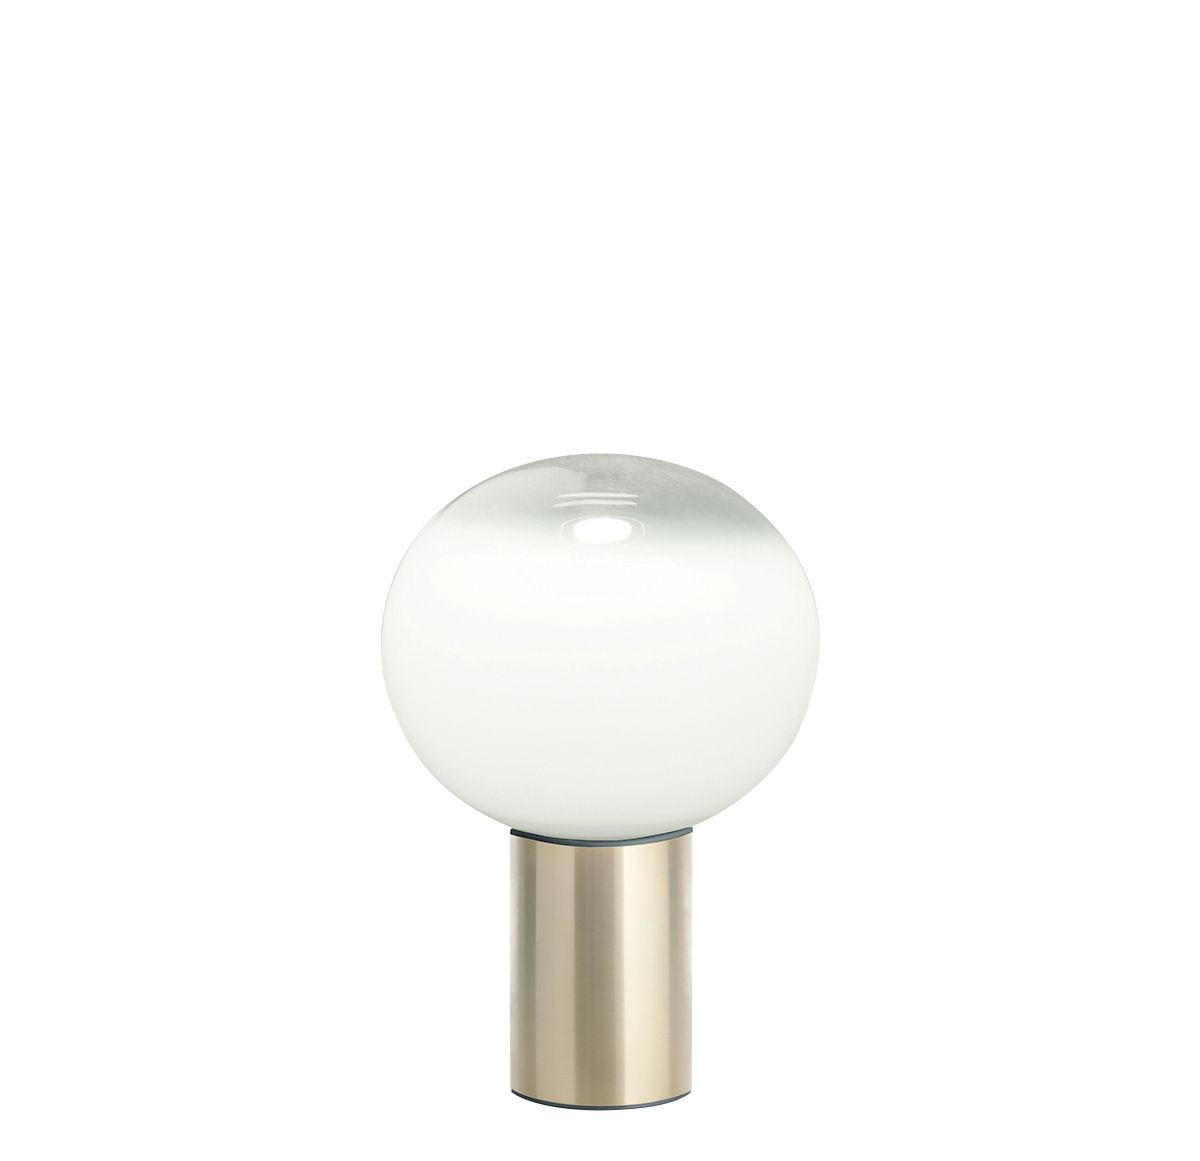 Lighting - Table Lamps - Laguna Table lamp - / Ø 16 x H 24 cm by Artemide - H 24 cm / Brass - Aluminium, Blown glass